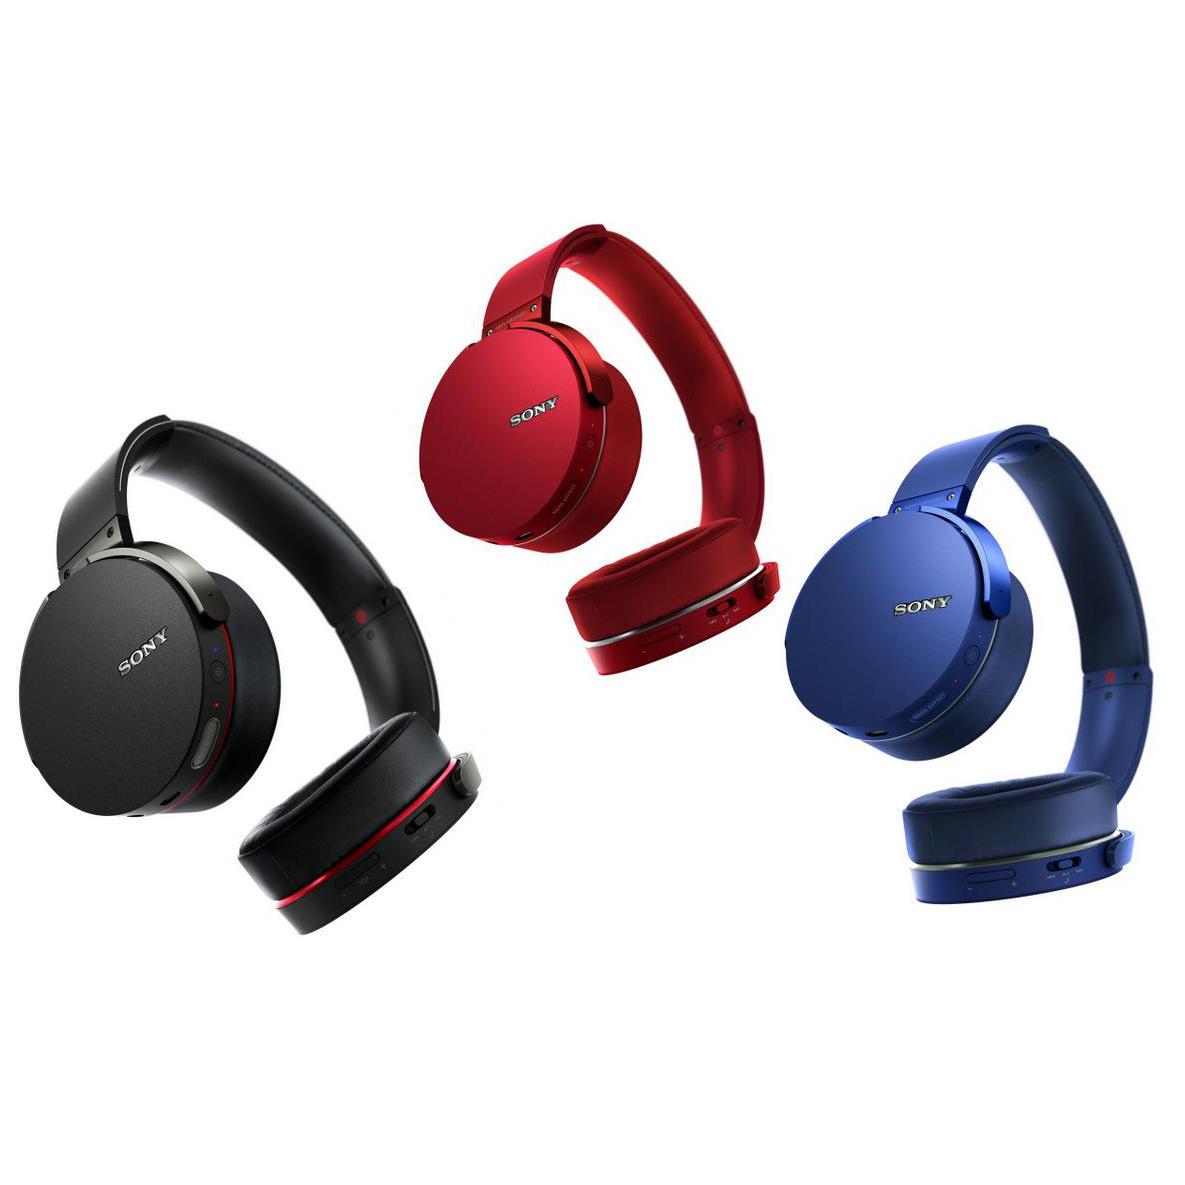 SONY MDR~XB950B1 無線耳機 EXTRA BASS 藍芽 NFC 貨